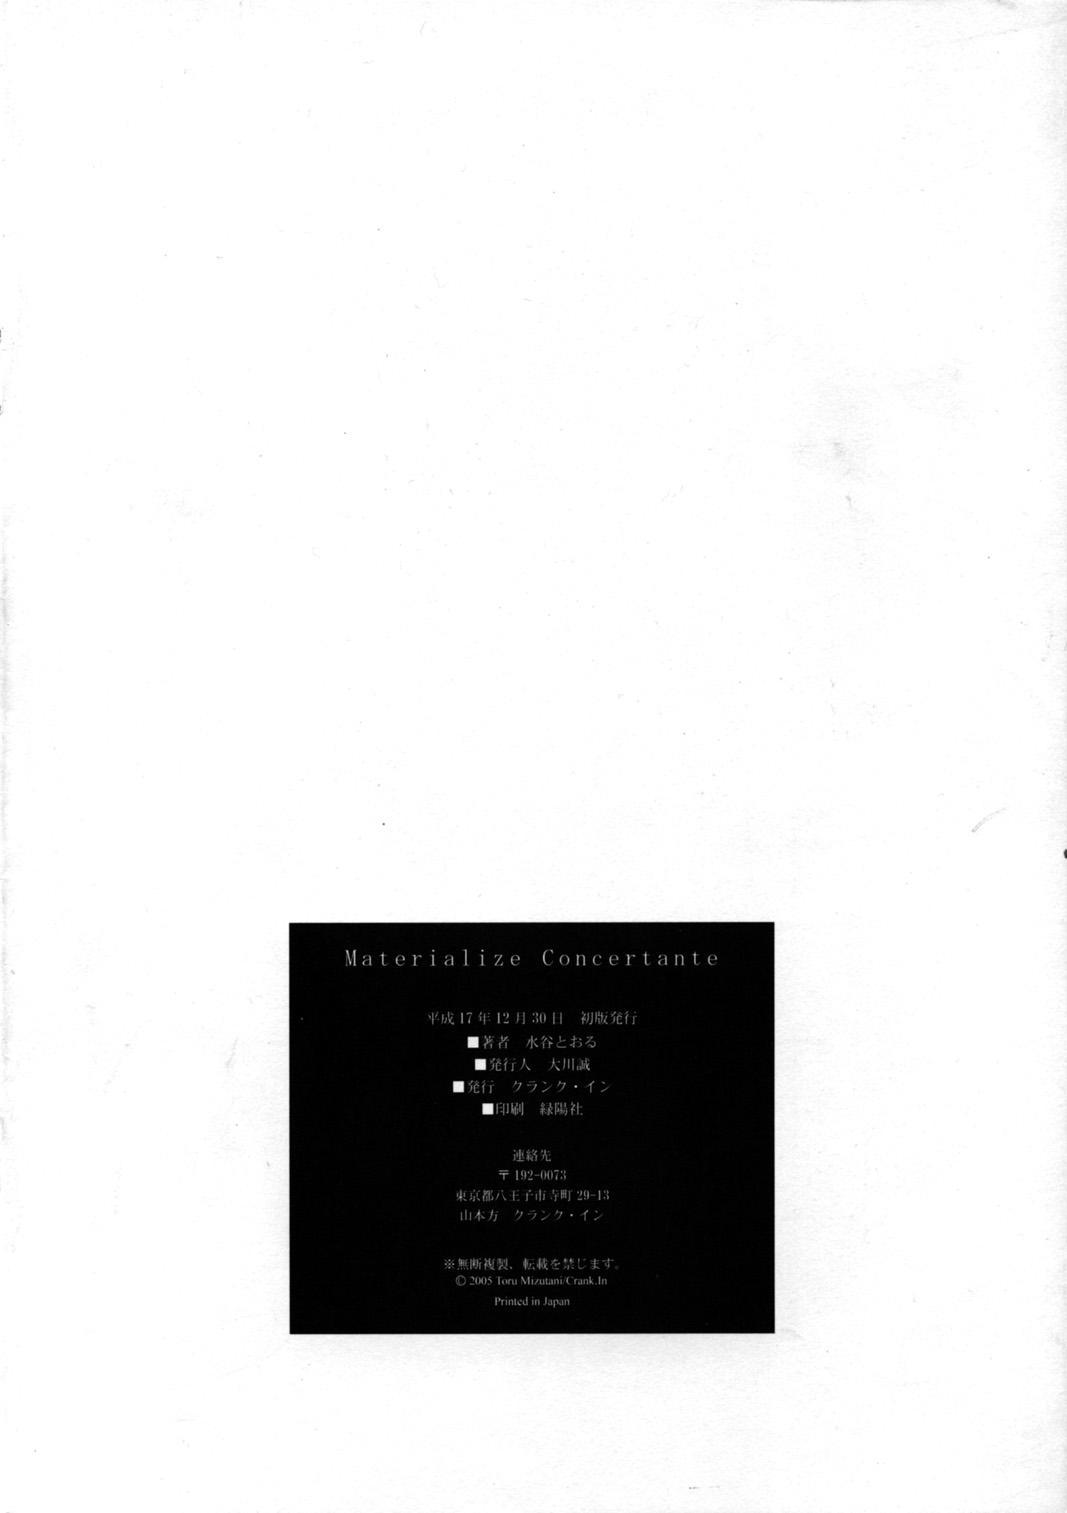 Materialize Concertante 21